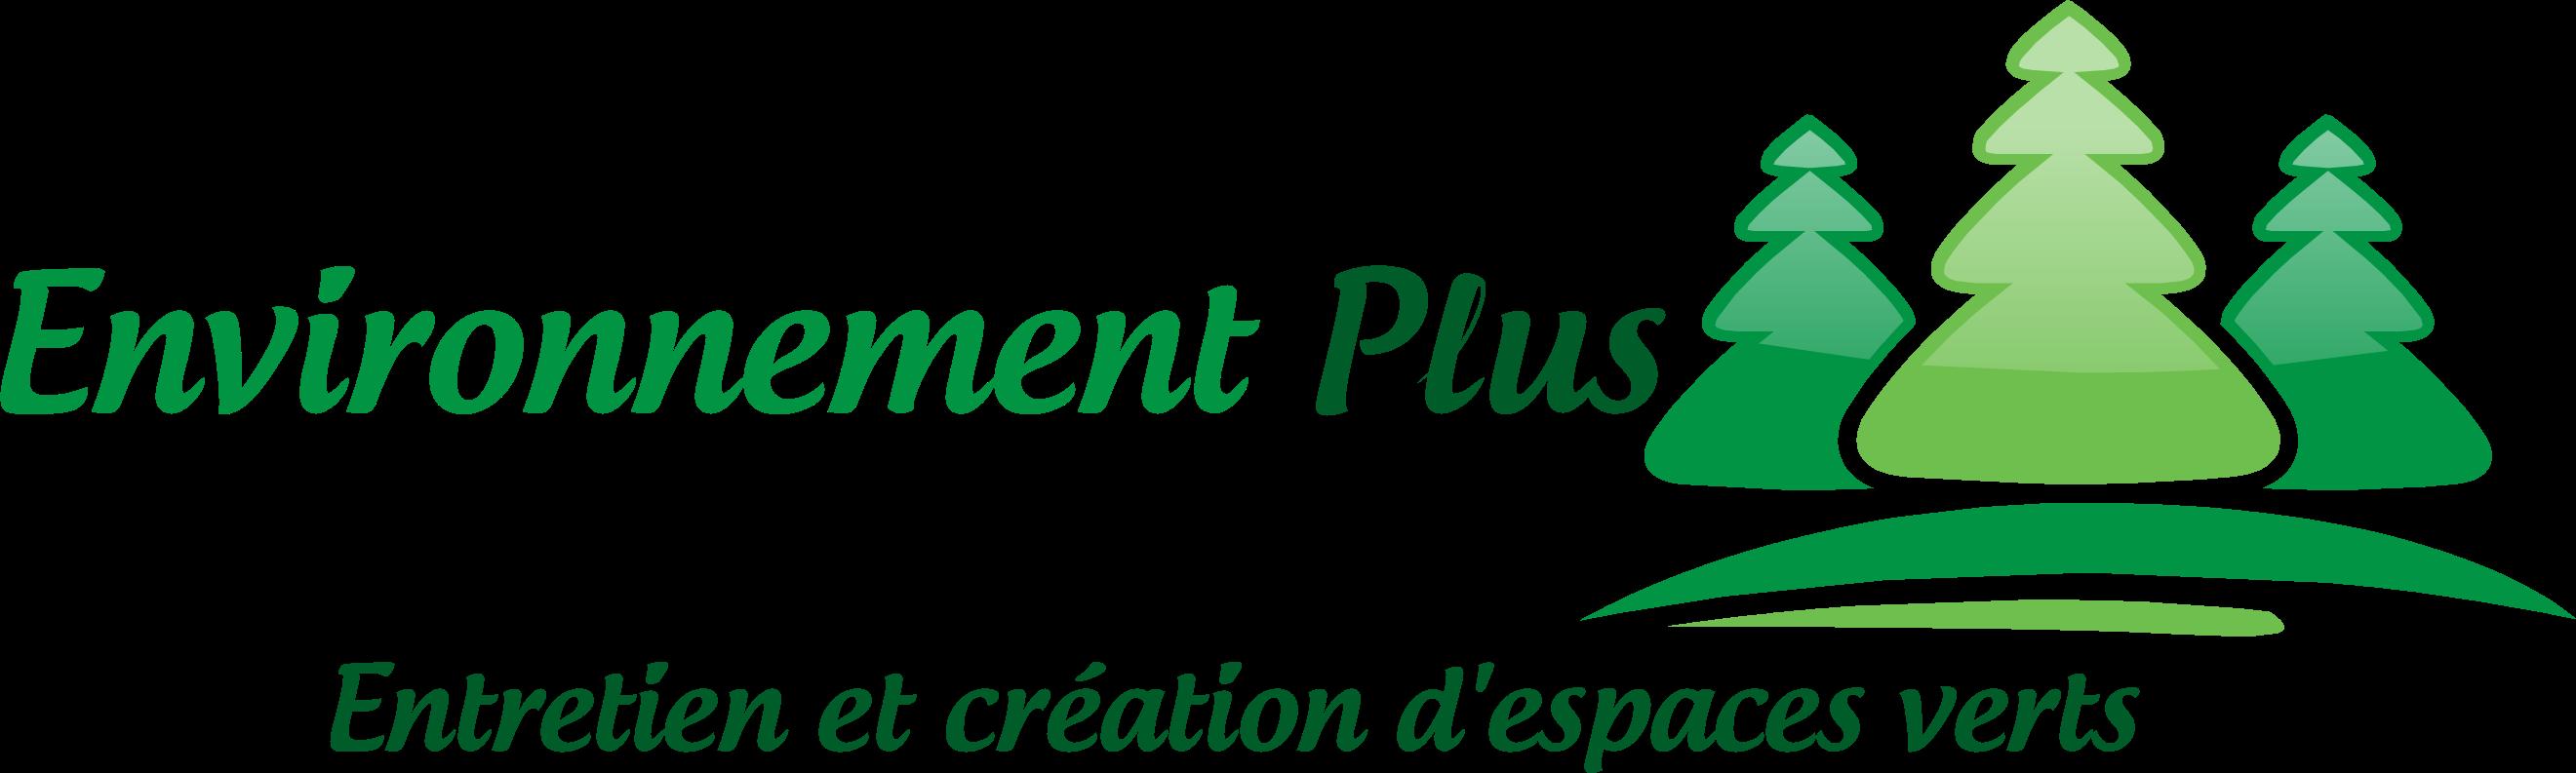 Logo environnement plus